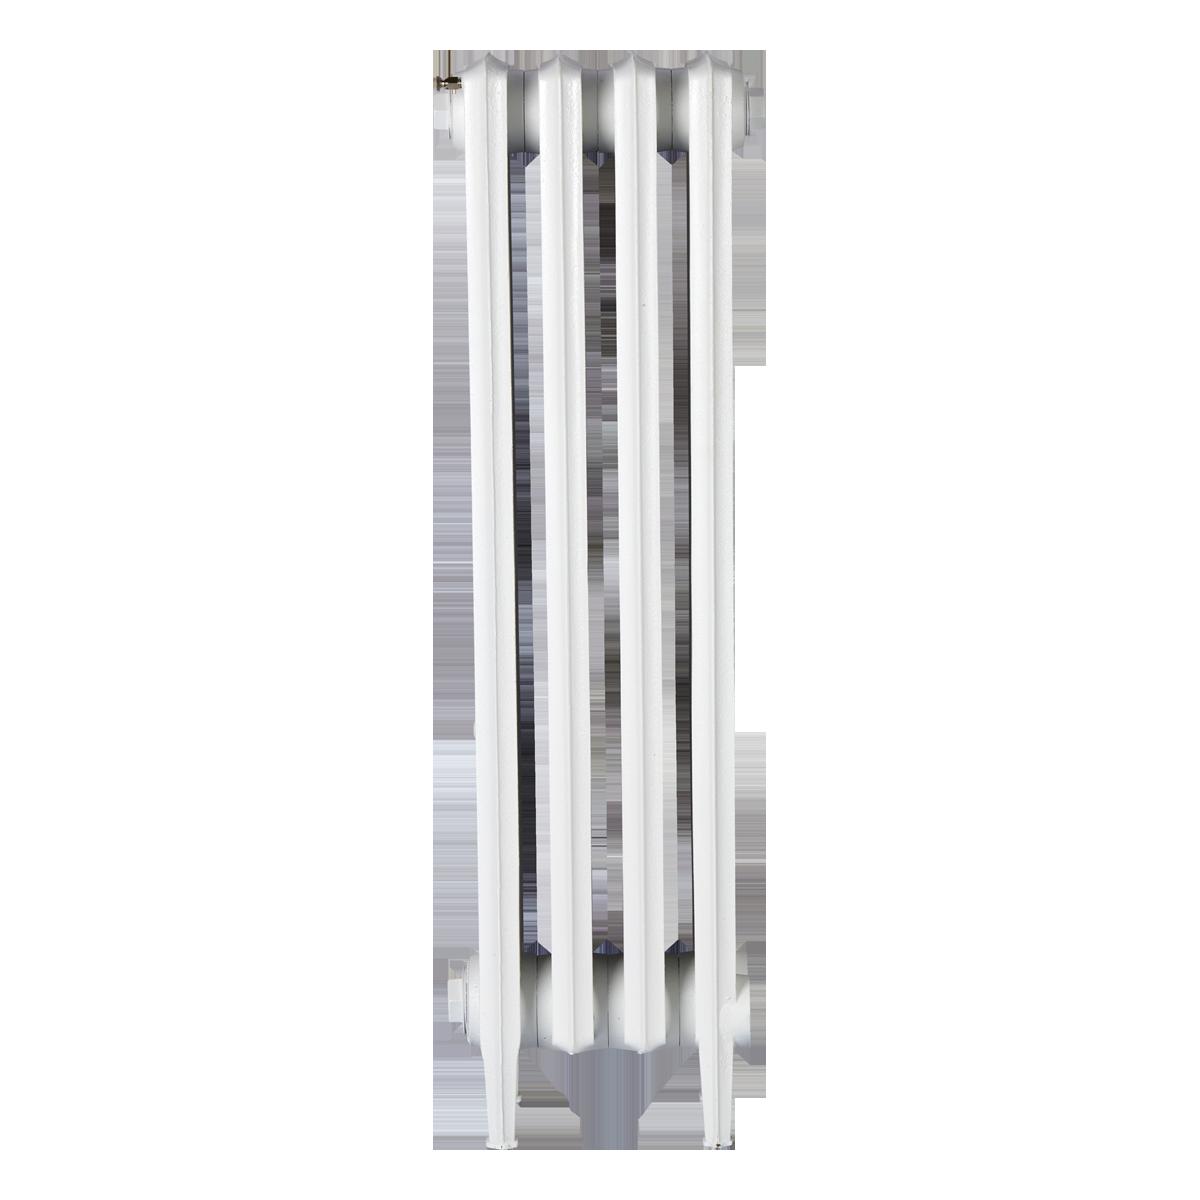 Ironworks Radiators Inc. classic column radiator